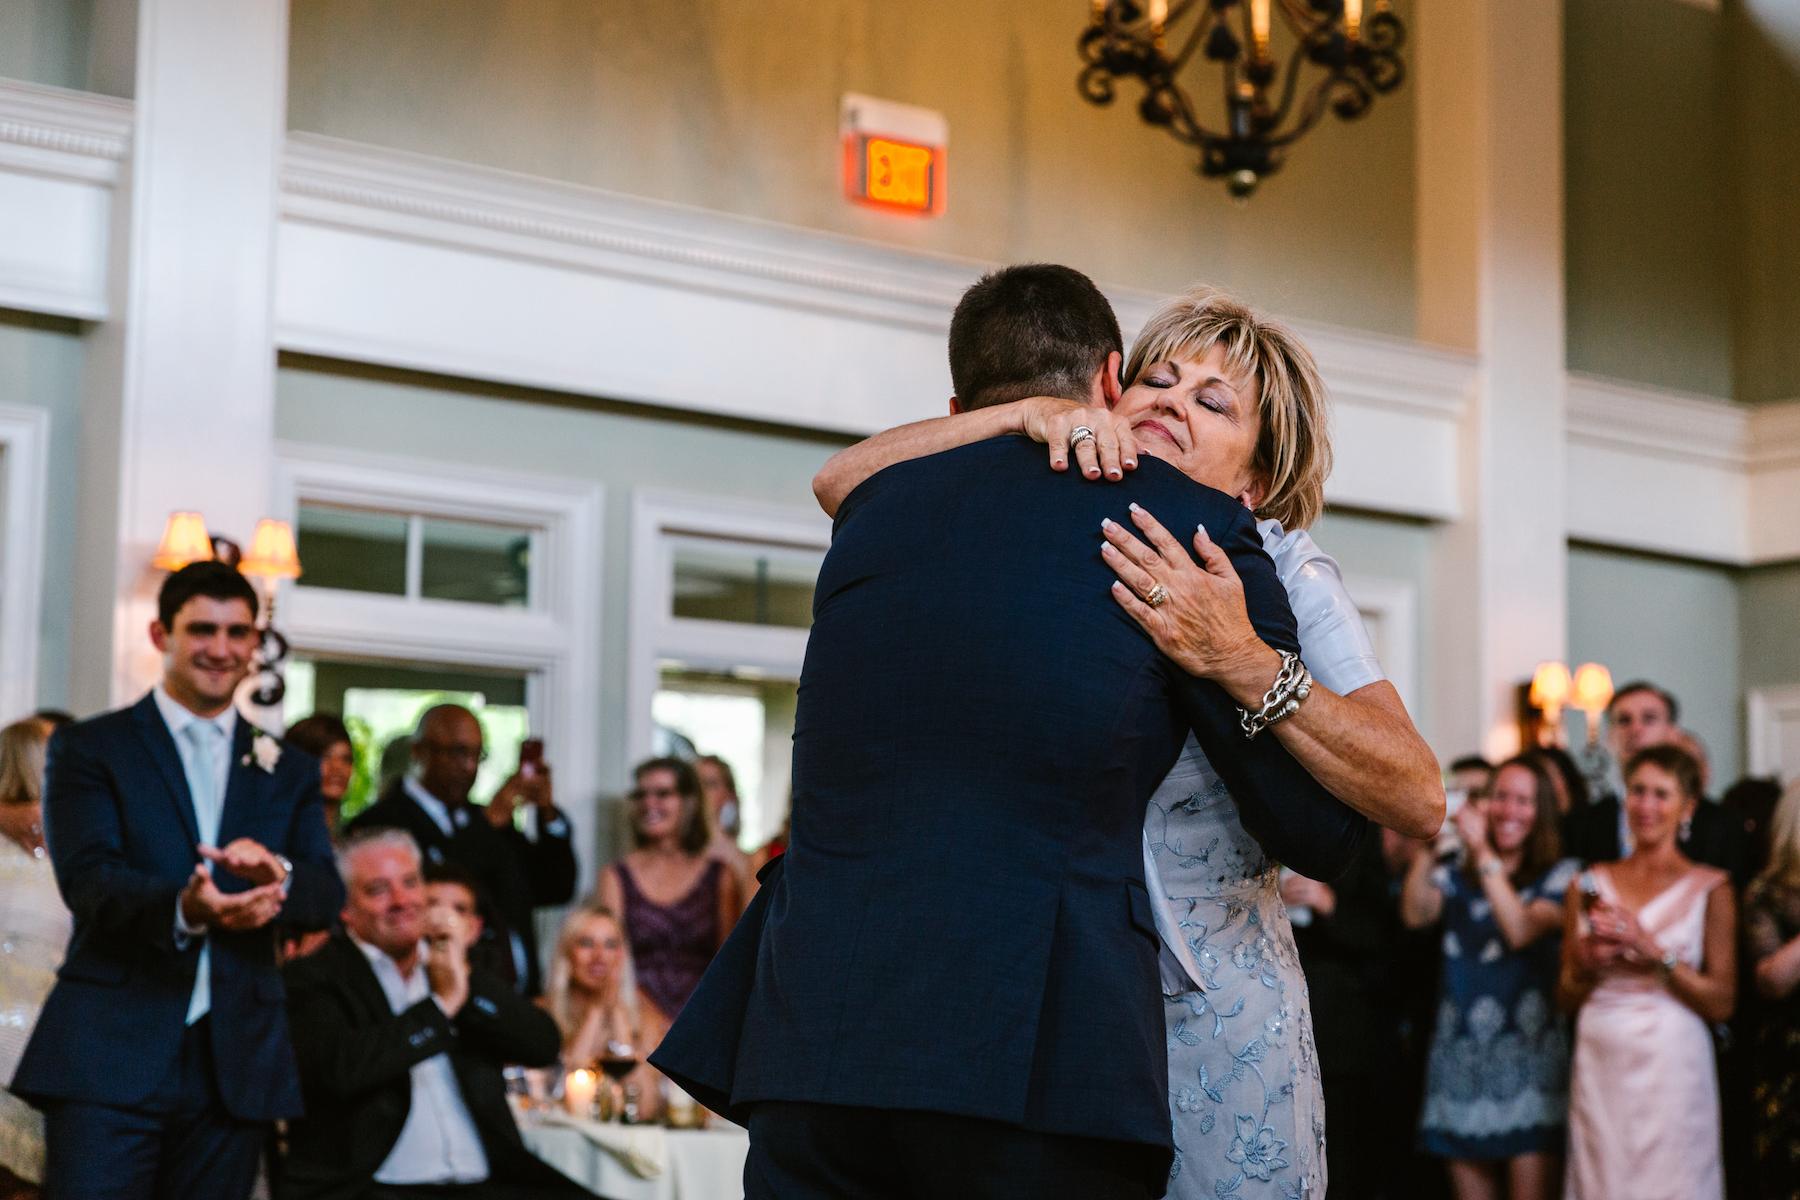 wedding-engagement-photographer-spartanburg-greenville-columbia-carolina-south-north-519.JPG